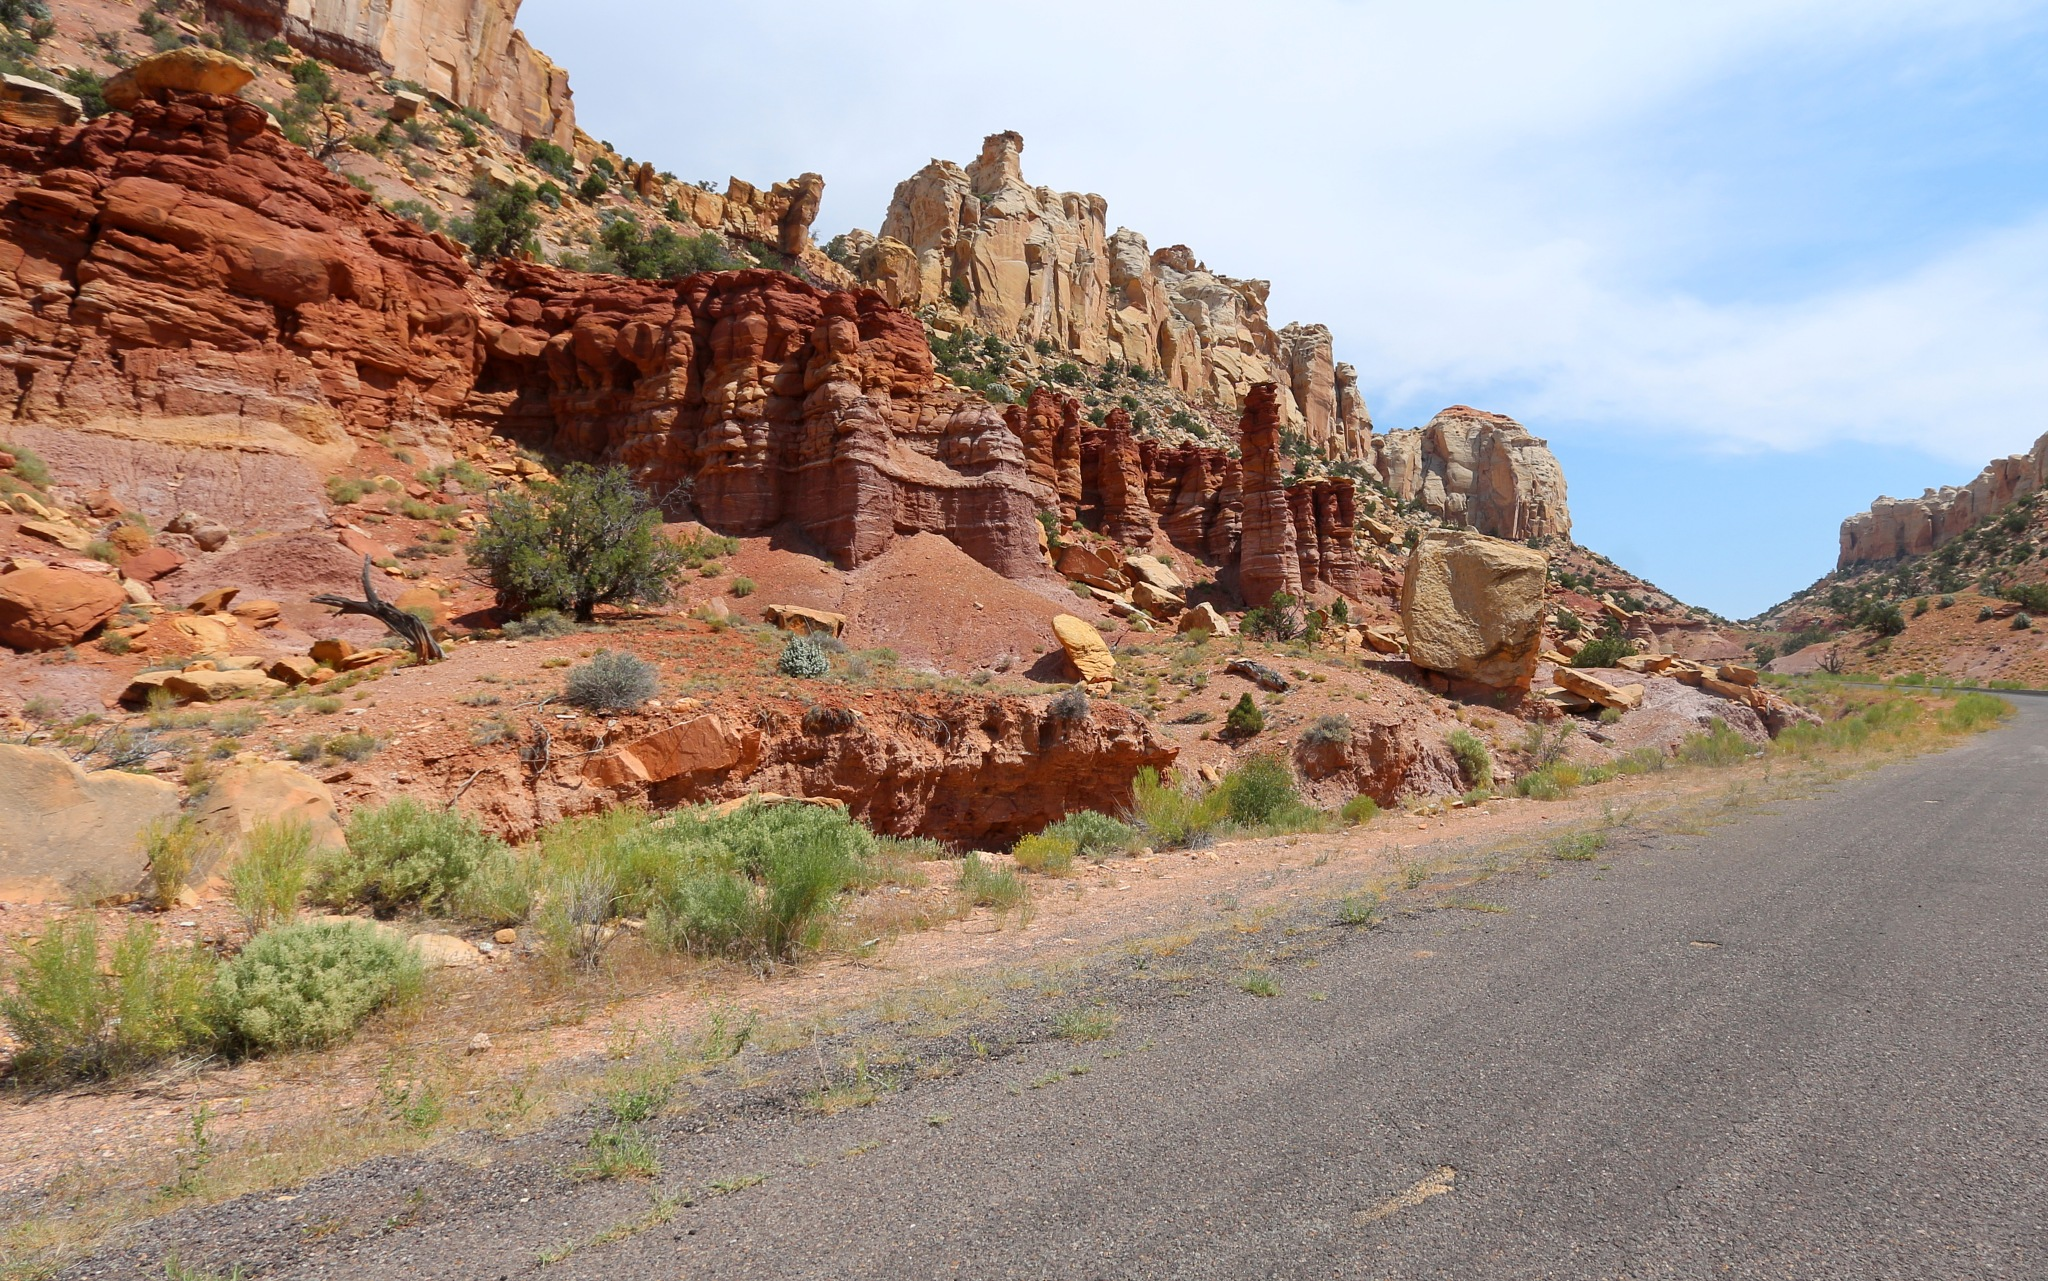 Burr trail road, UT by katze